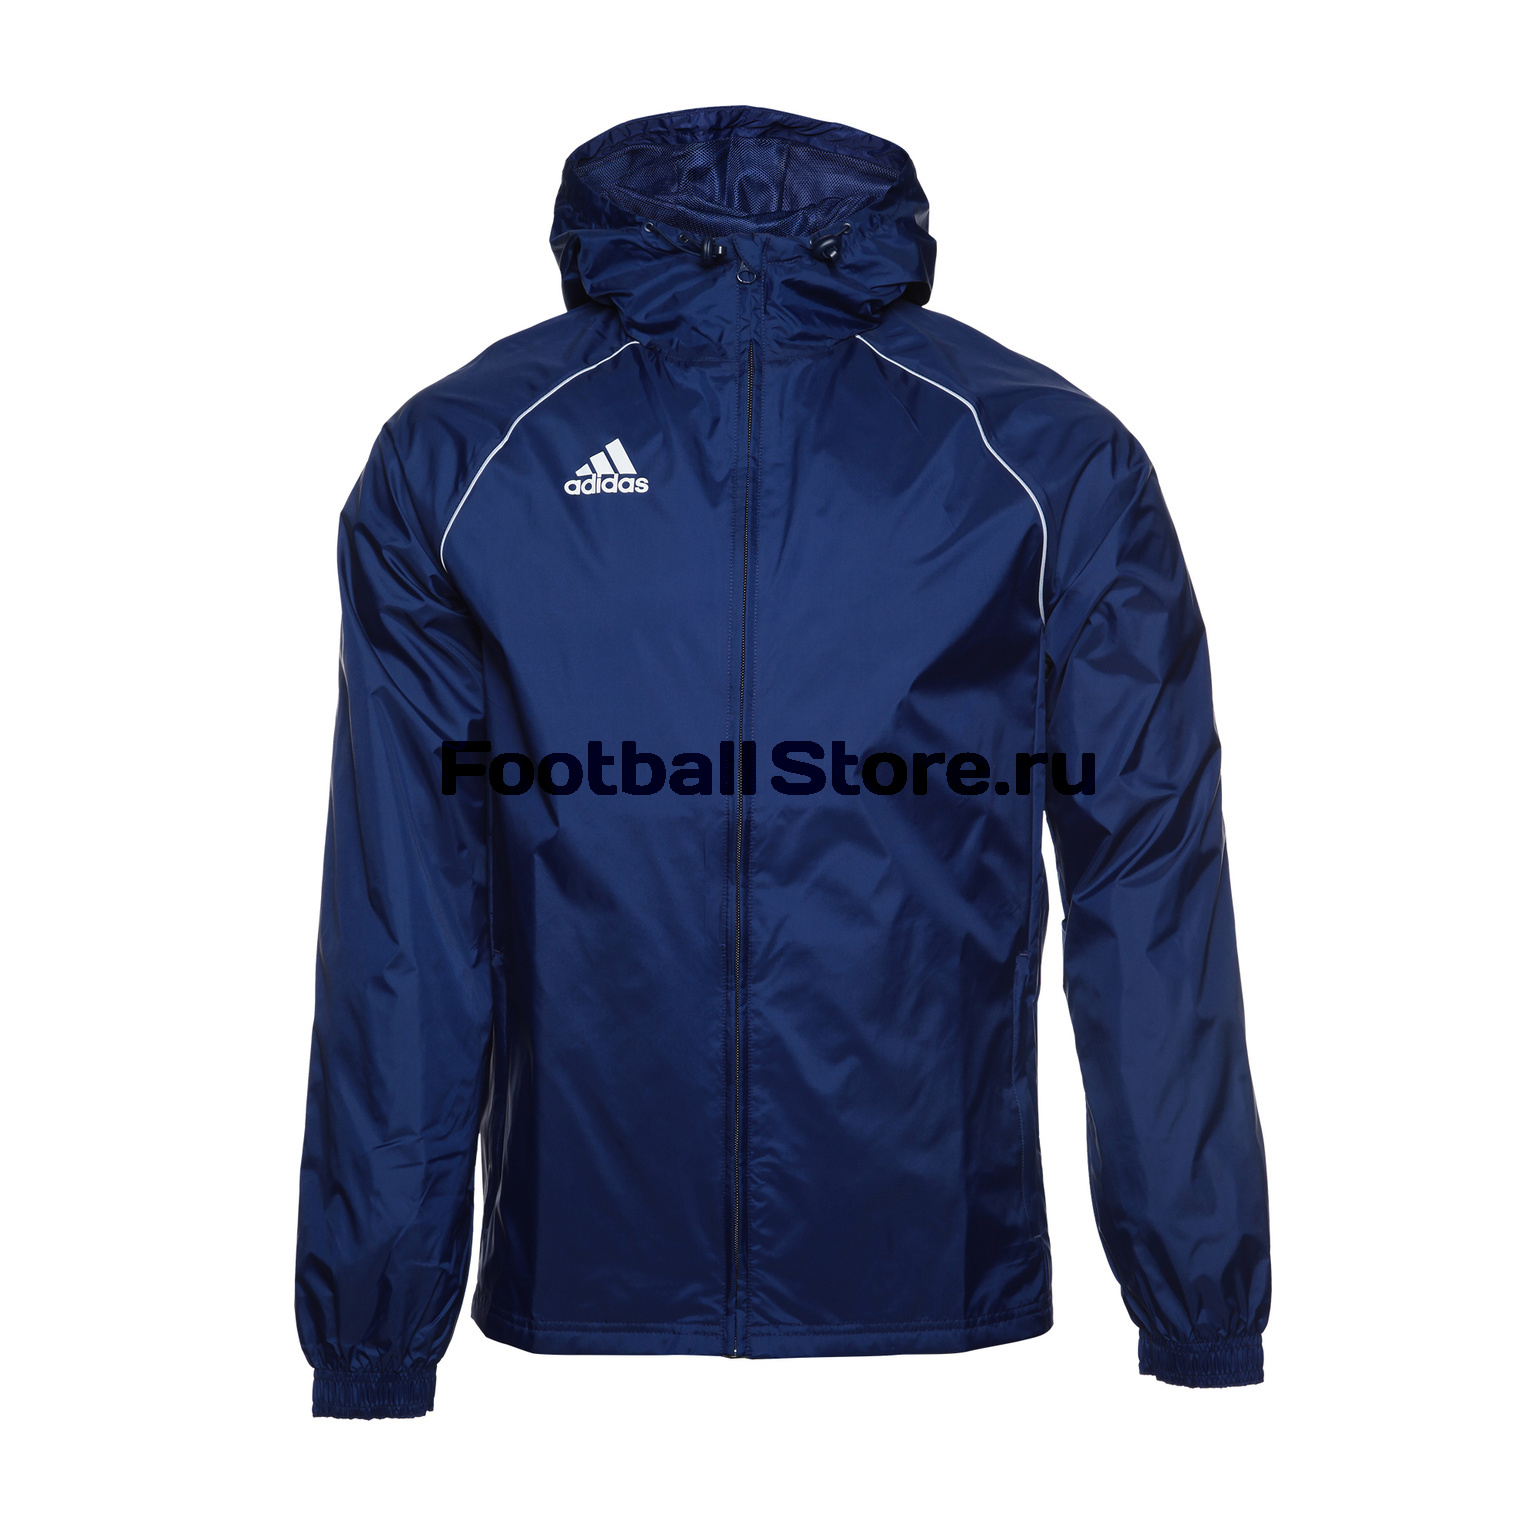 Ветровка Adidas Core18 Rain Jkt CV3694 цена